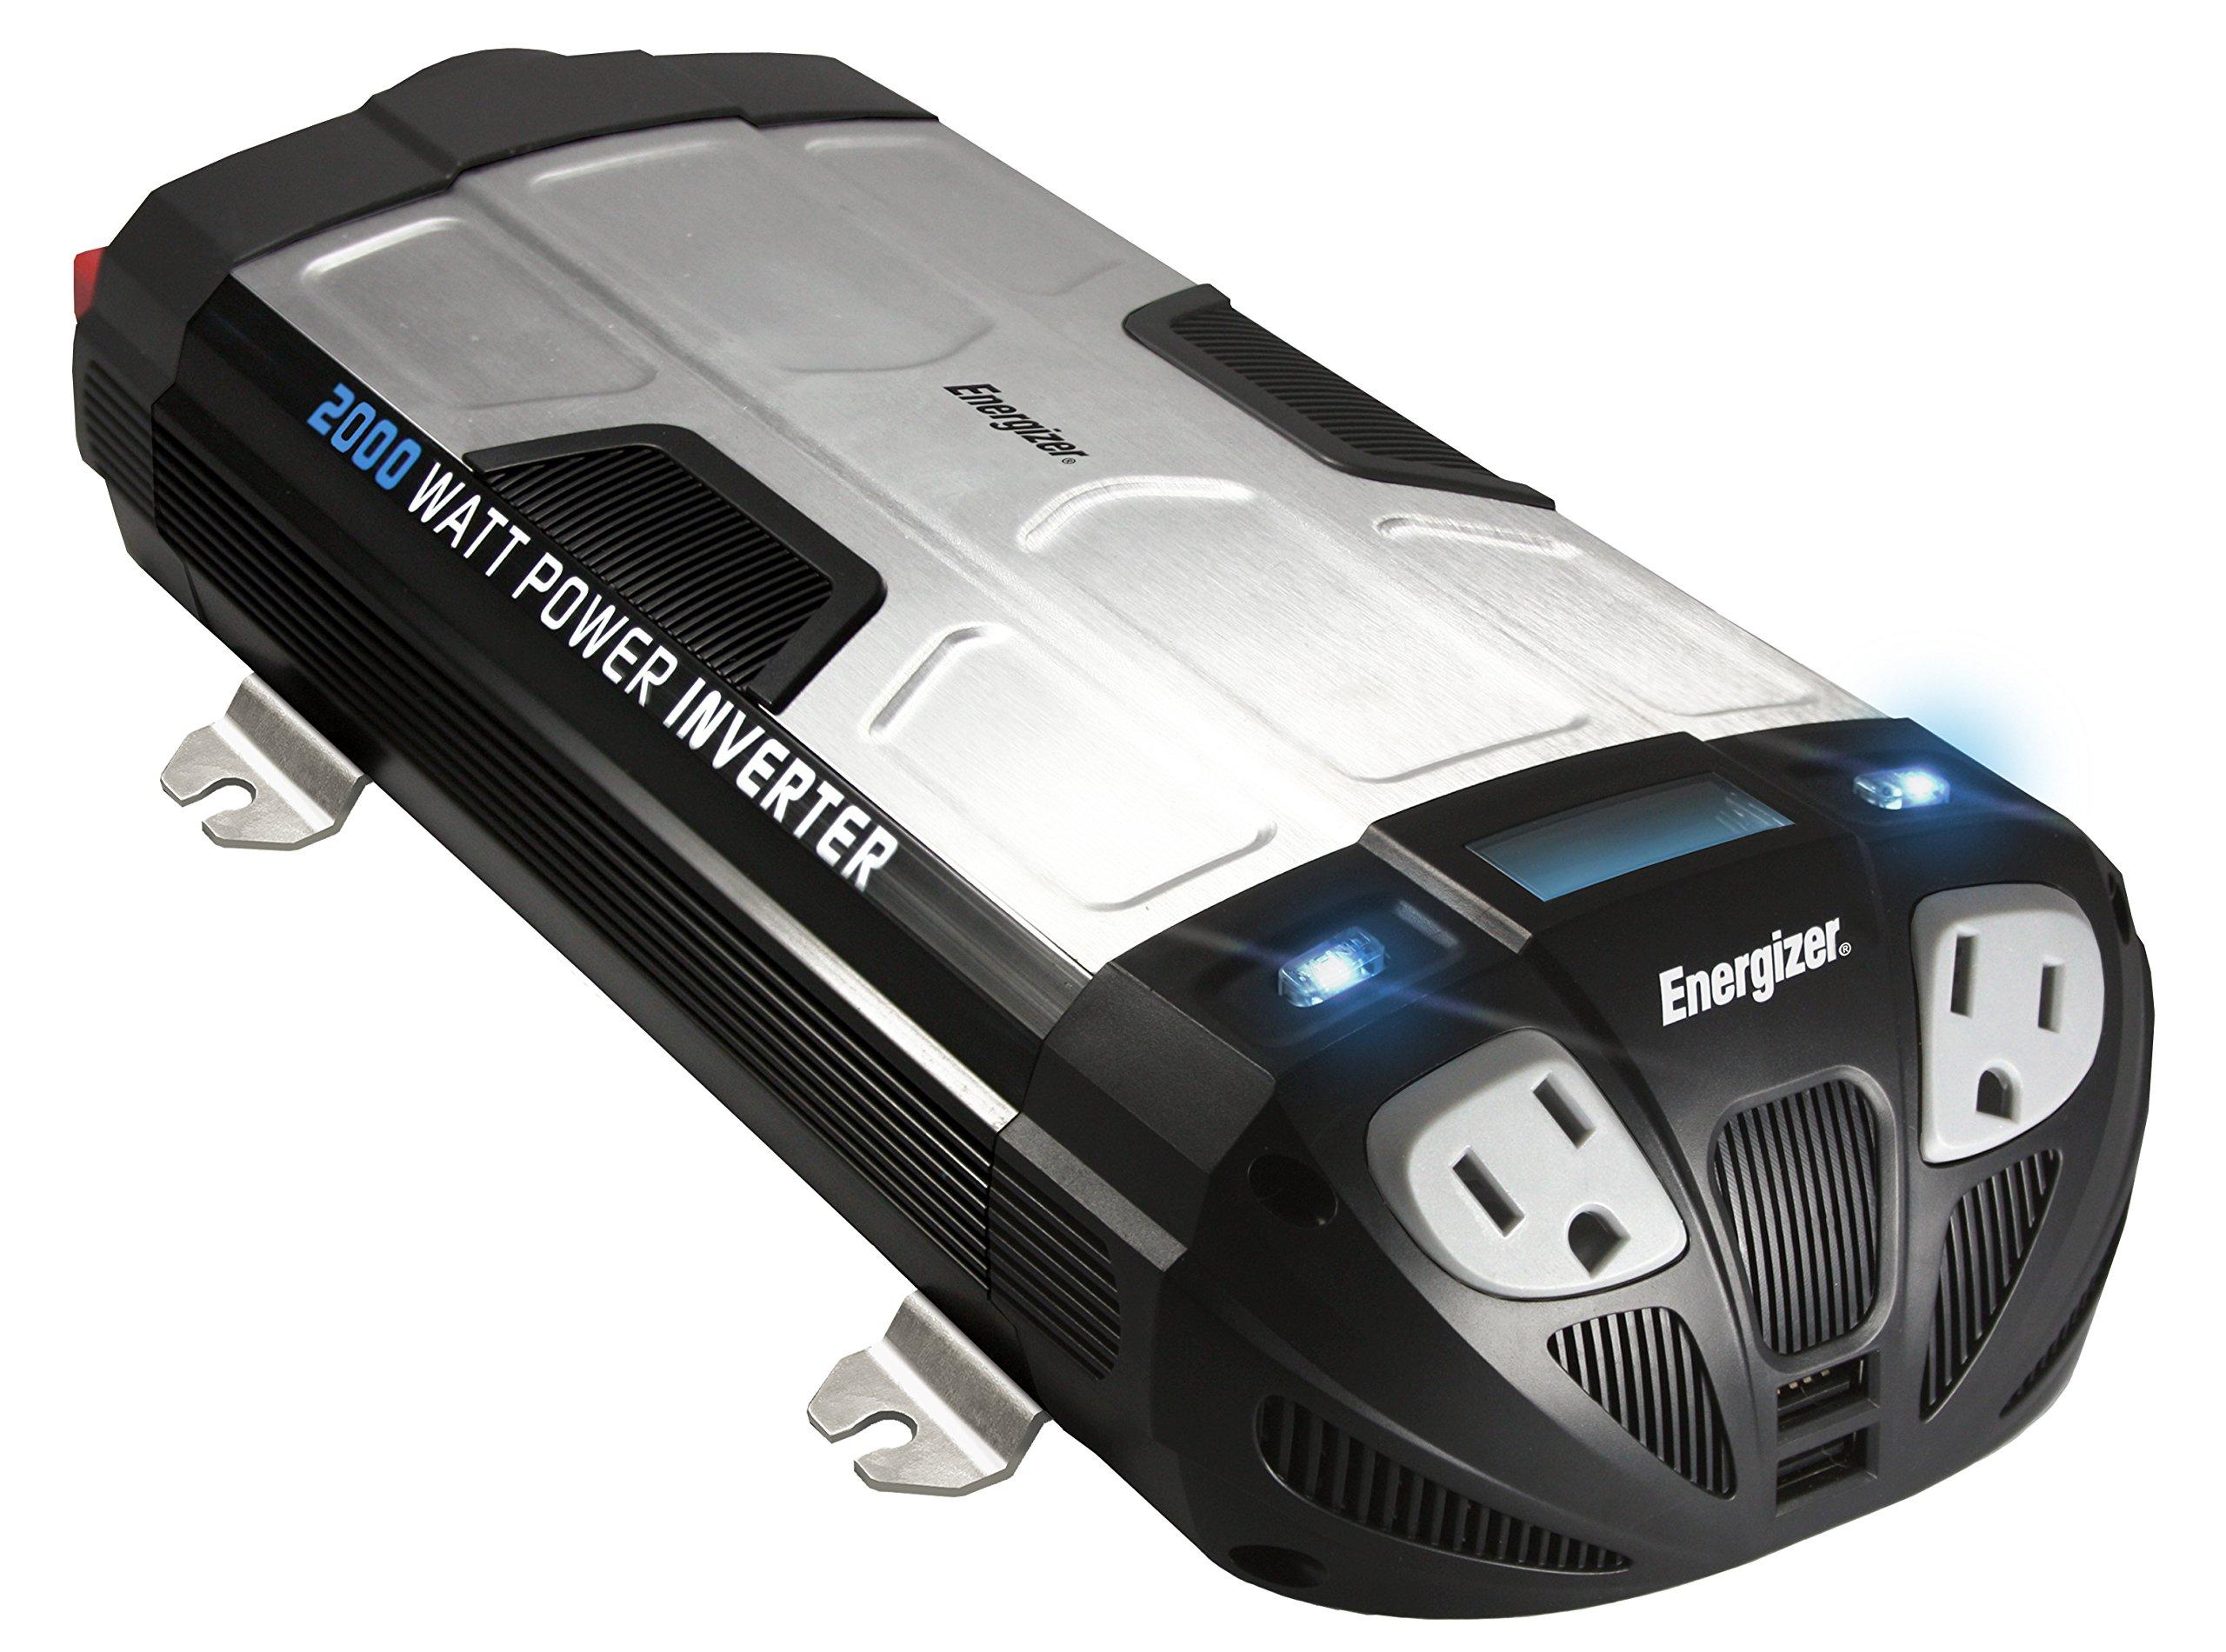 ENERGIZER 2000 Watt Power Inverter converts 12V DC from car's battery to 120 Volt AC